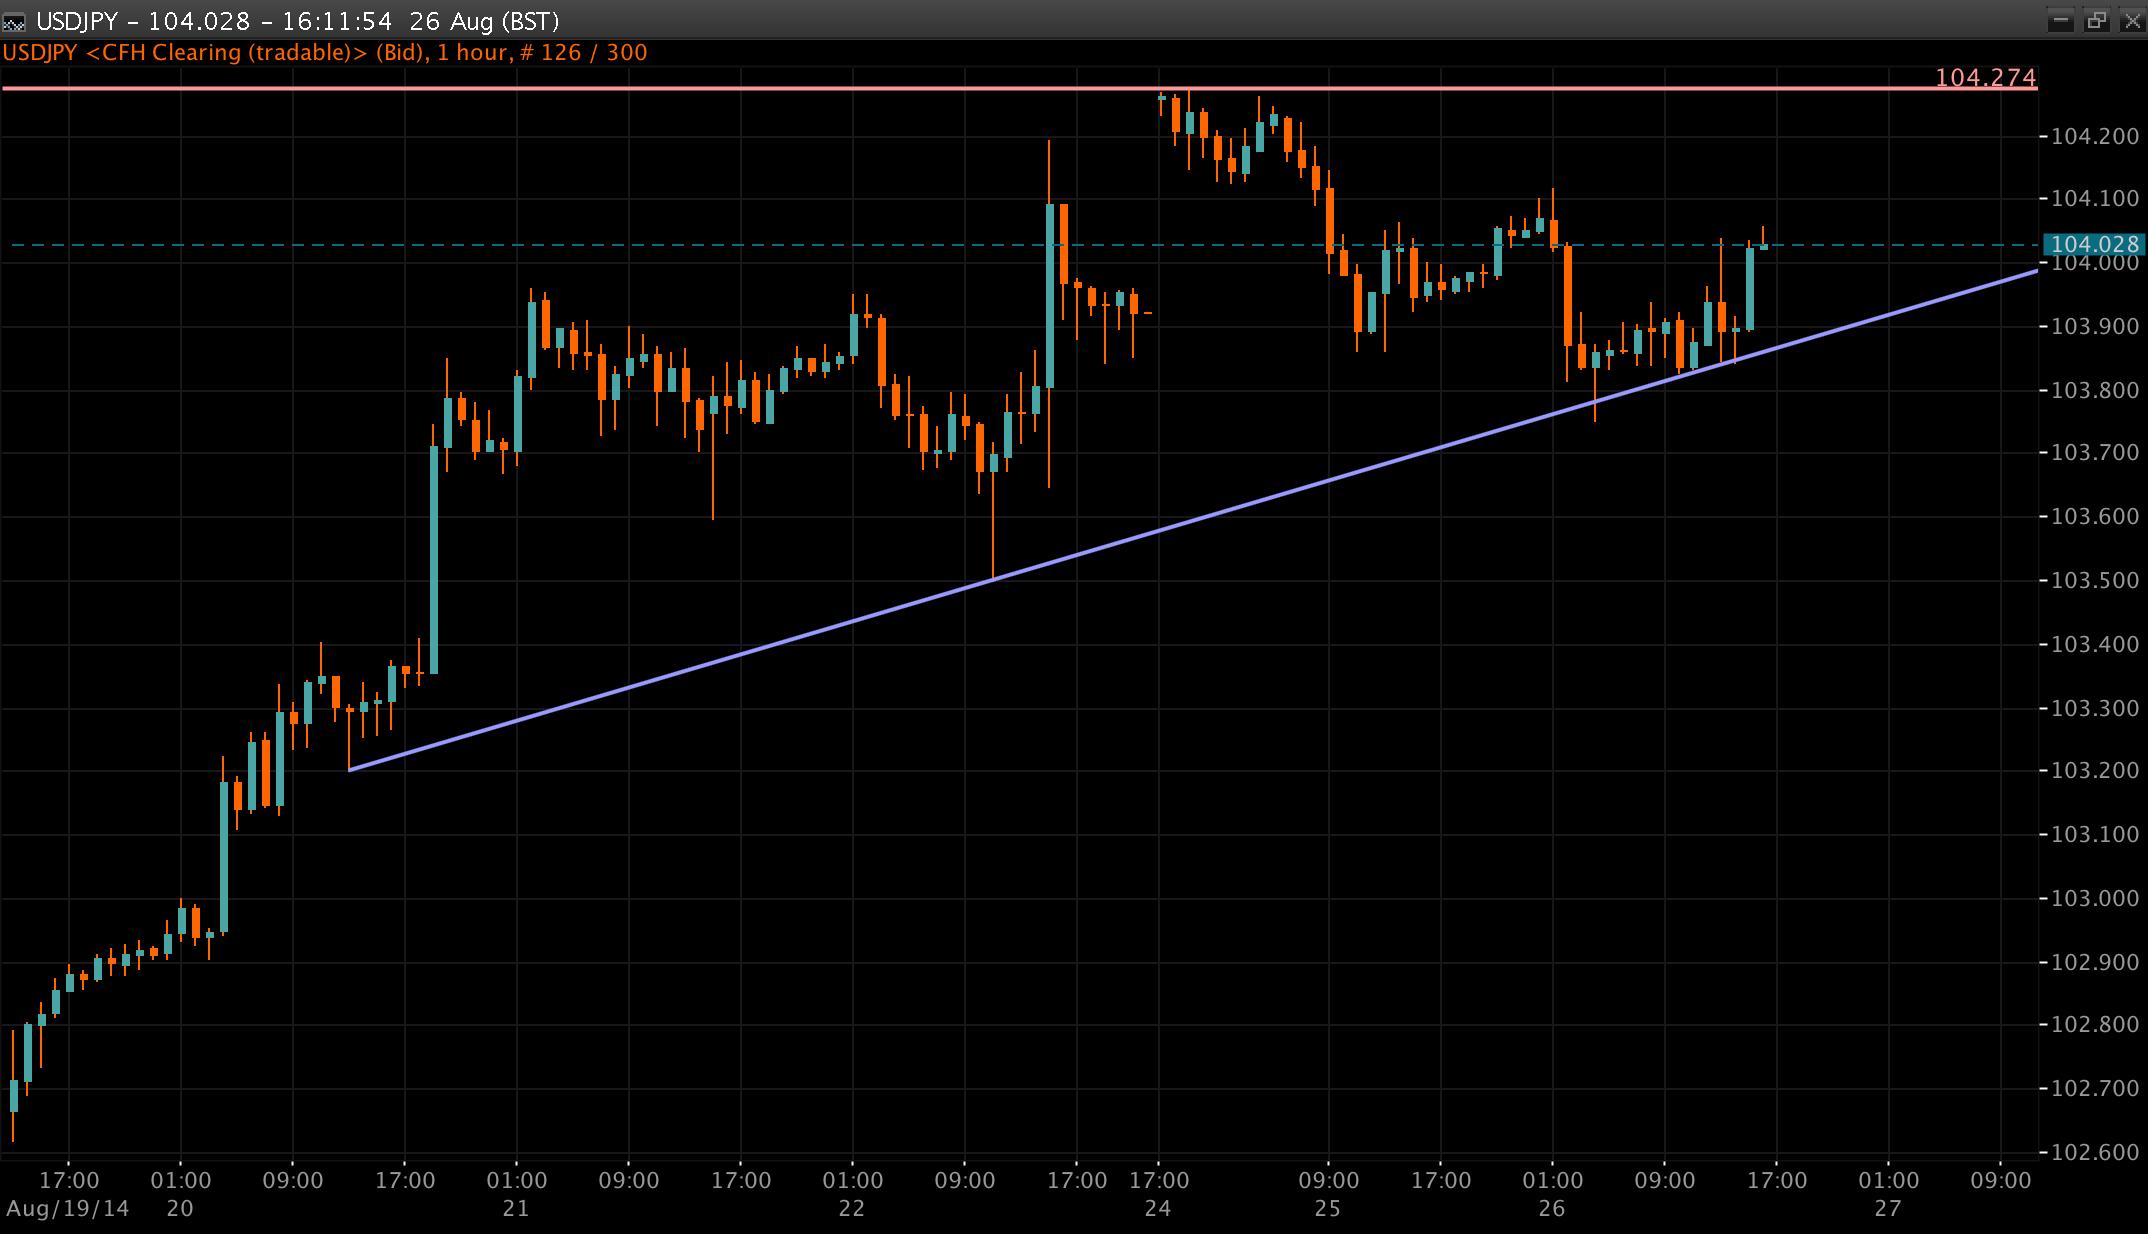 USD/JPY Chart 22 Aug 2014